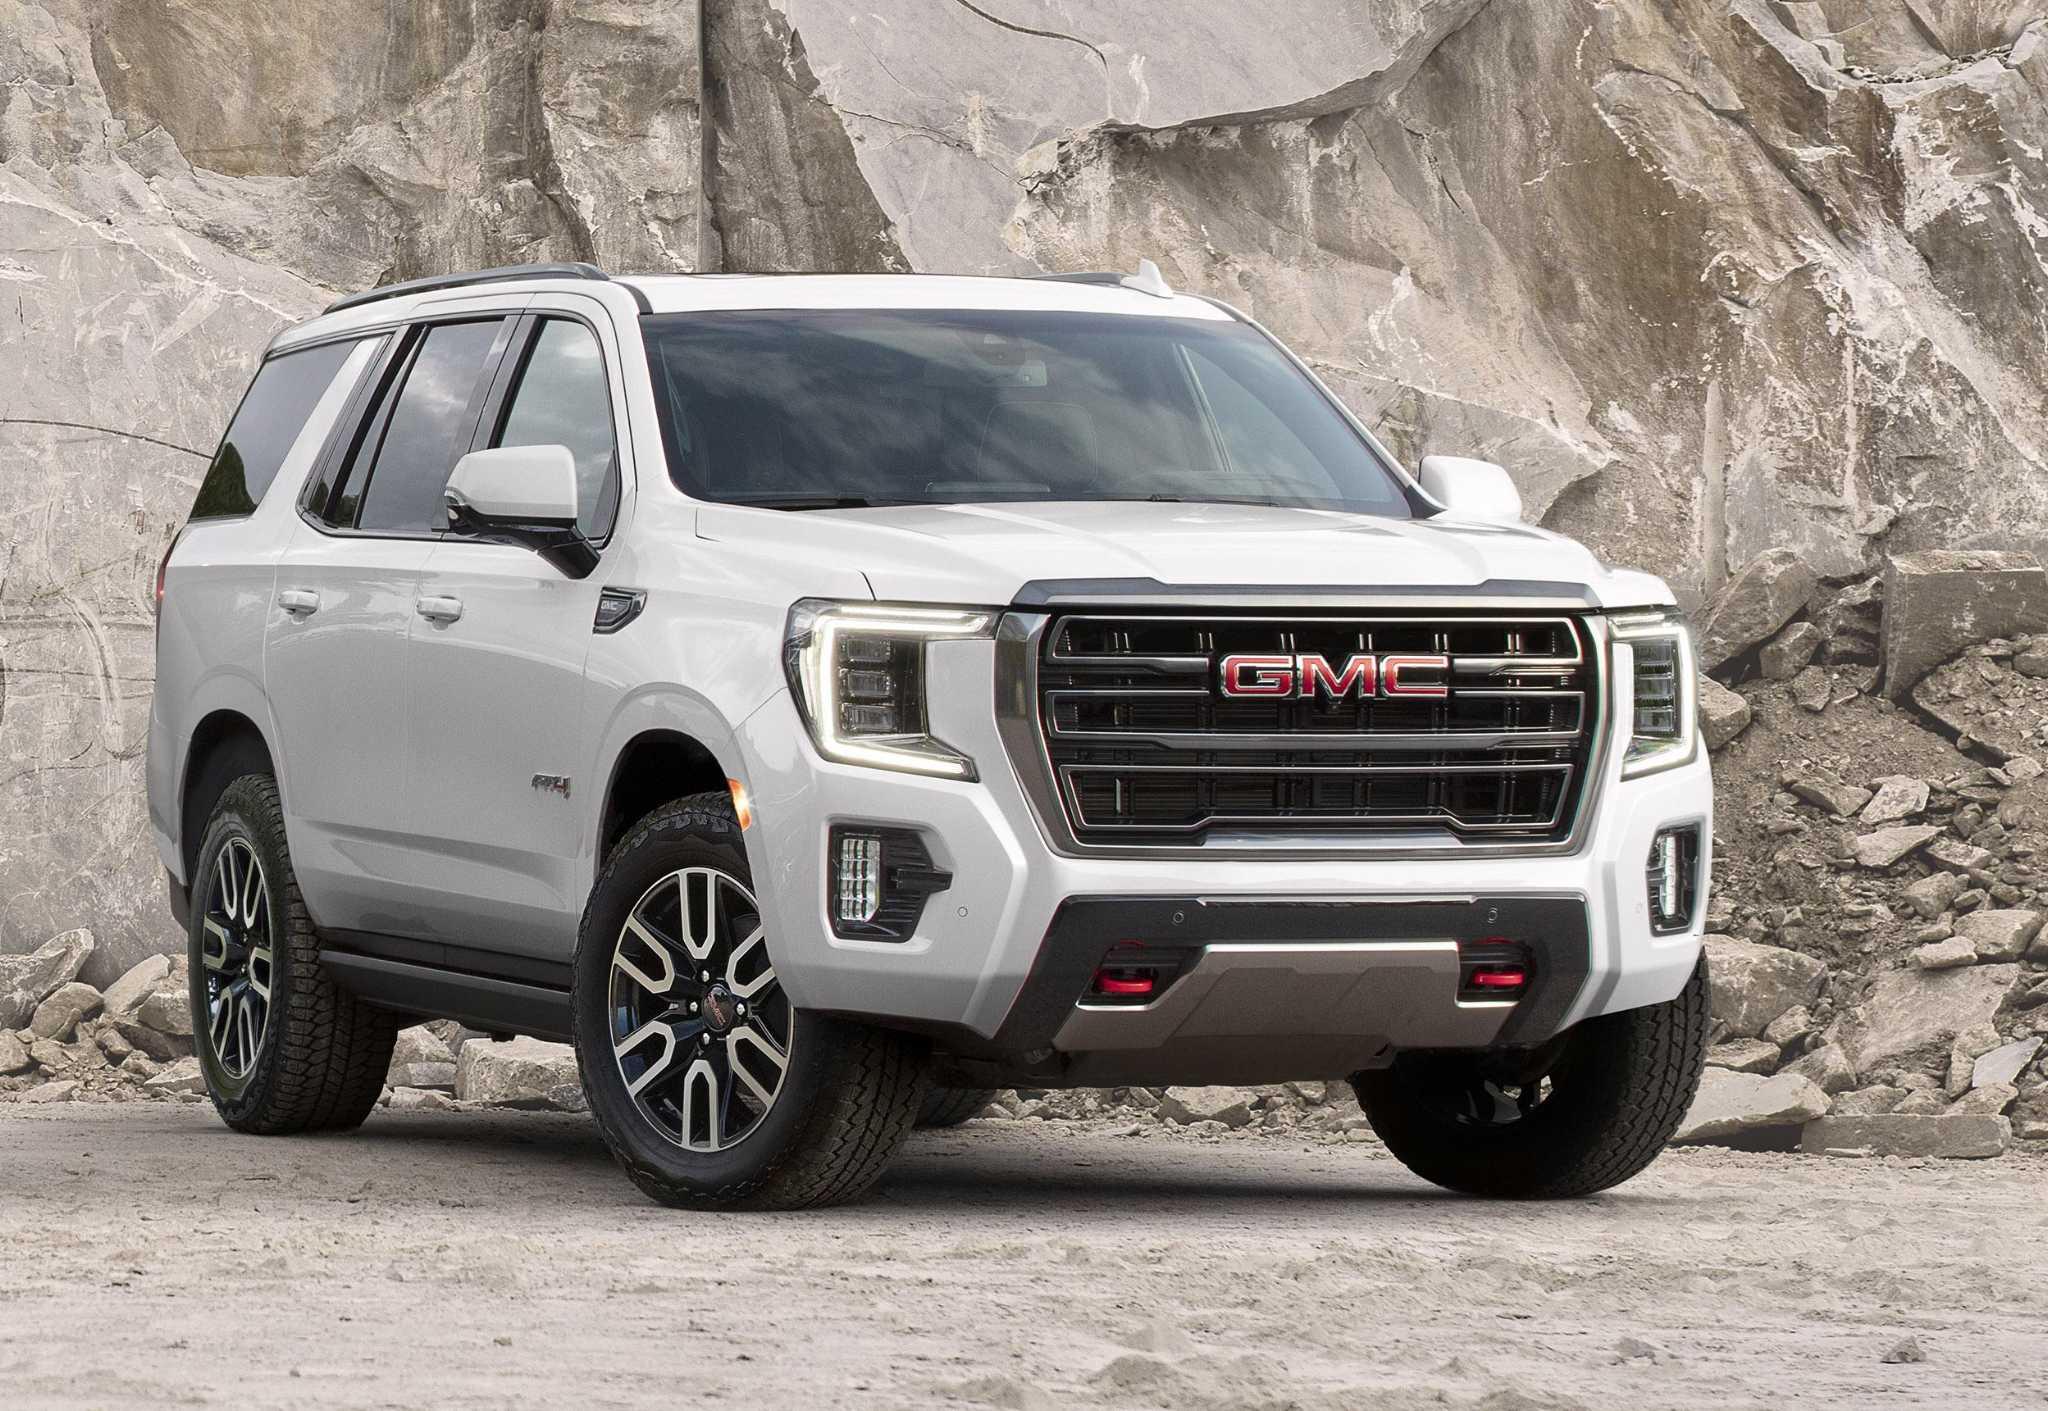 All-new Yukon 2021 SUV launches this summer - Houston ...